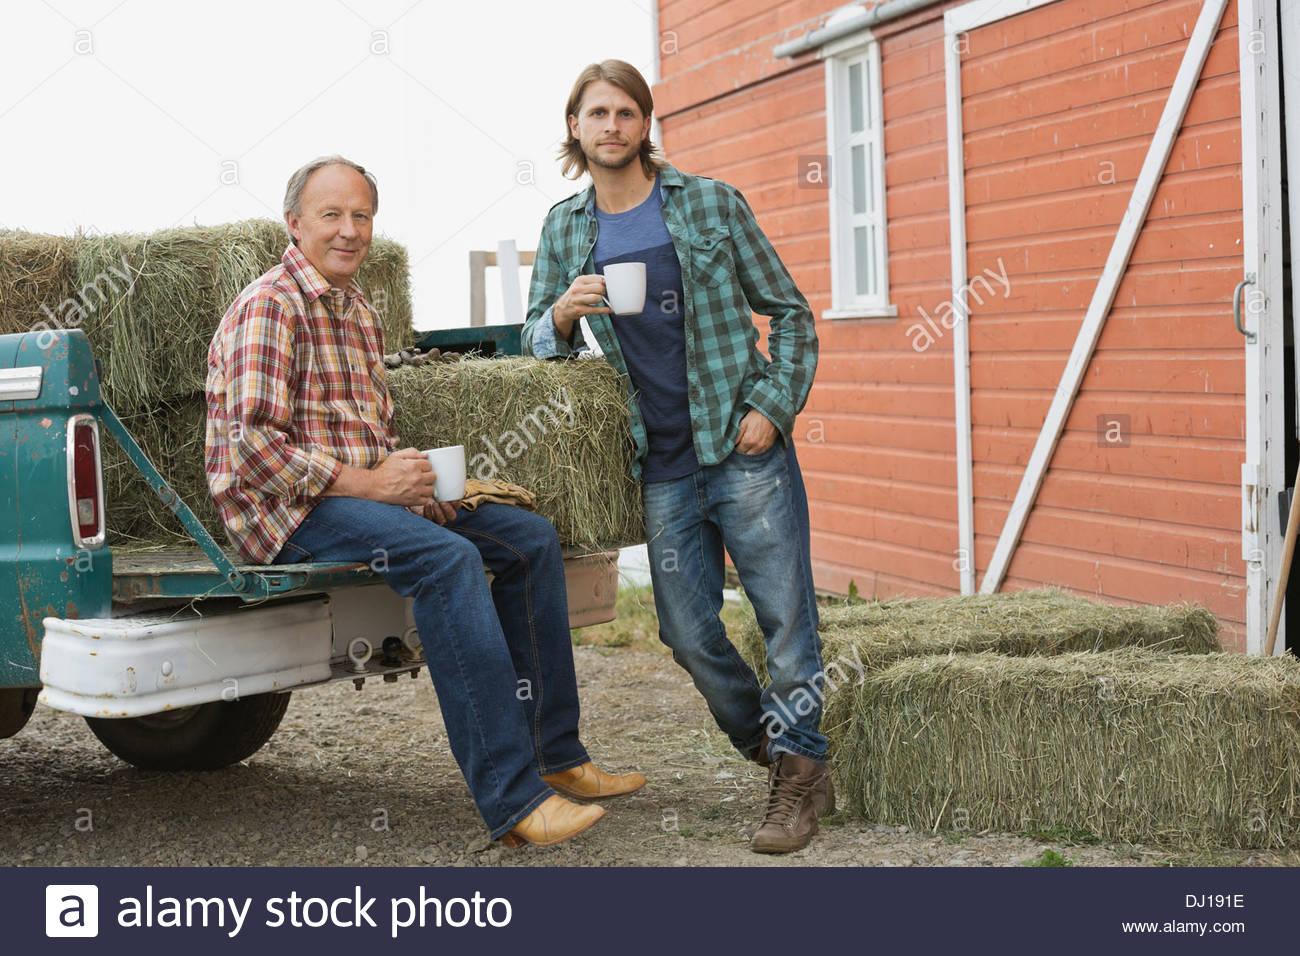 Vater und Sohn Kaffeetrinken von Pick-up-Truck mit Heuballen Stockbild